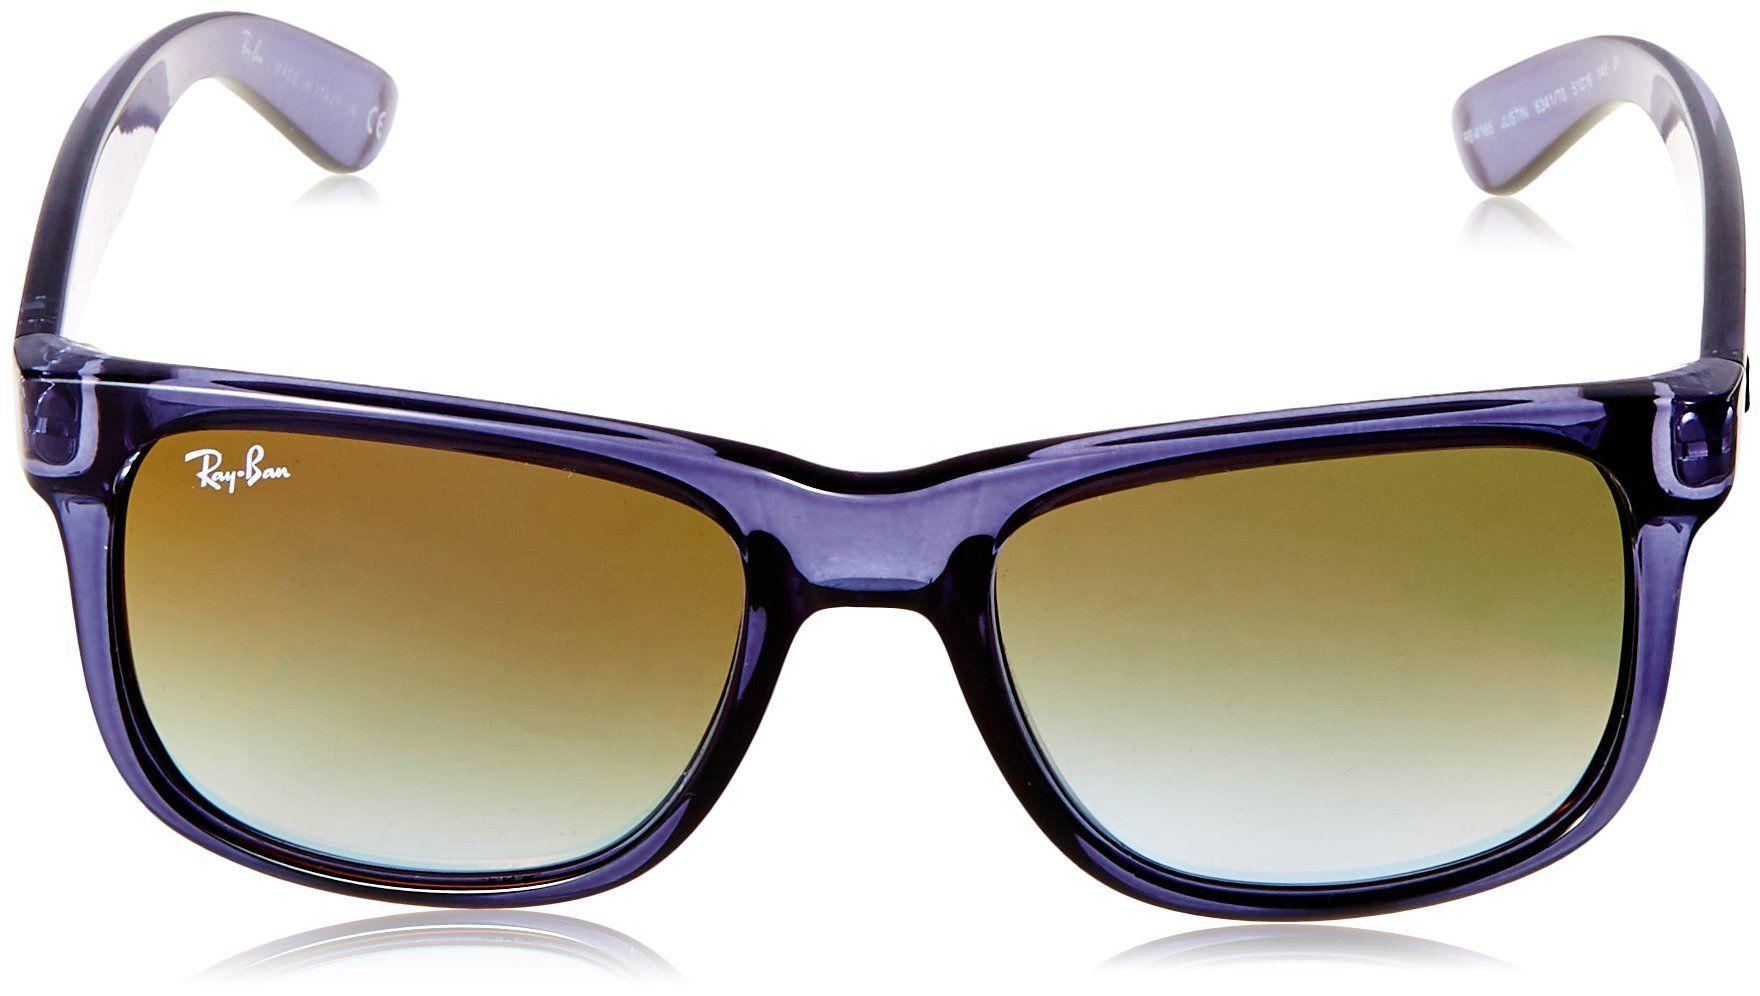 9835ff3501 RayBan Mens Nylon Man NonPolarized Iridium Rectangular Sunglasses  Trasparent Blue 50 mm    Visit the